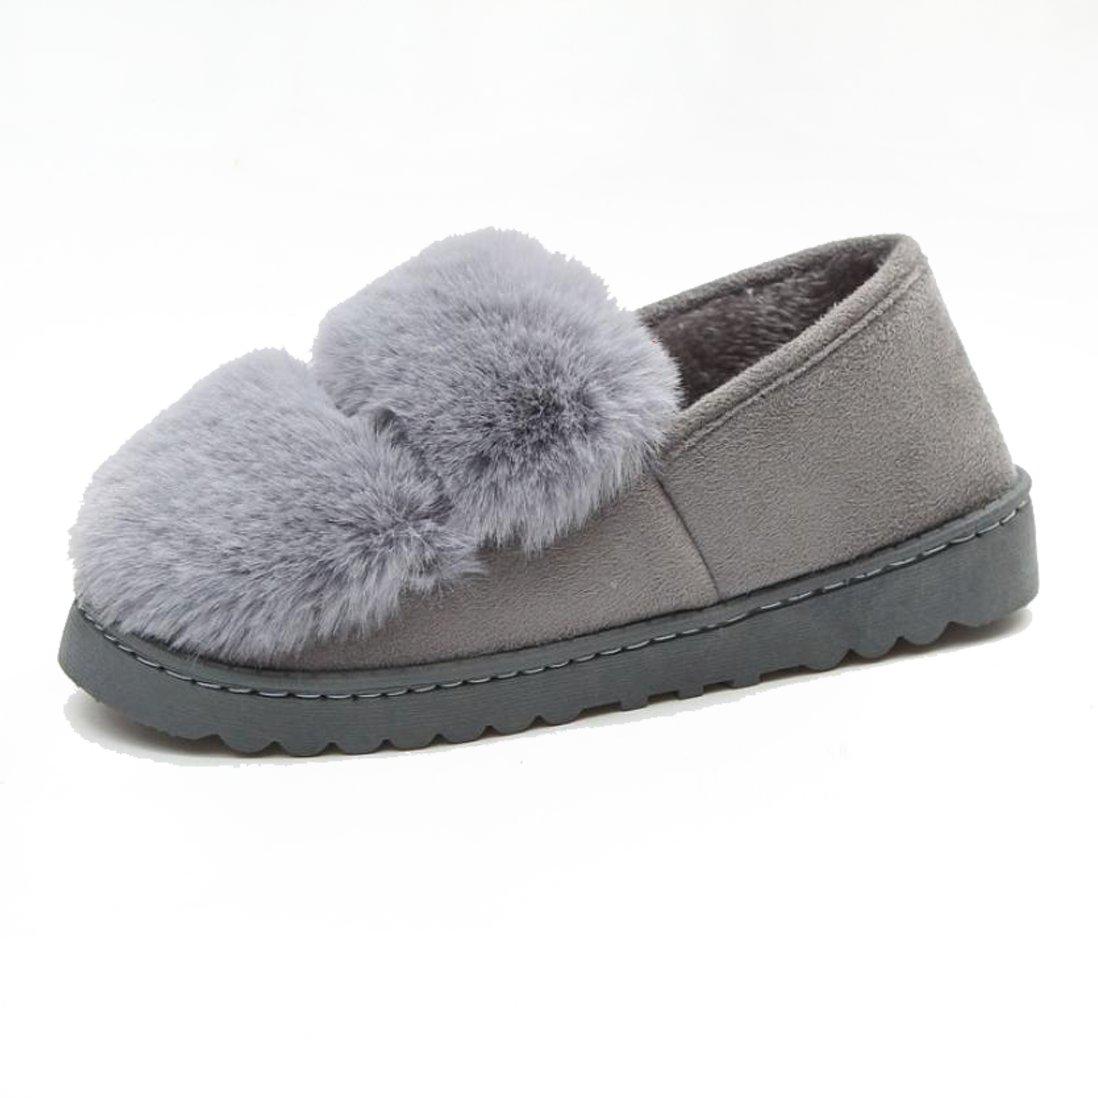 Perman Women's Soft Plush Lining Slip-on Memory Foam Slippers PM-919